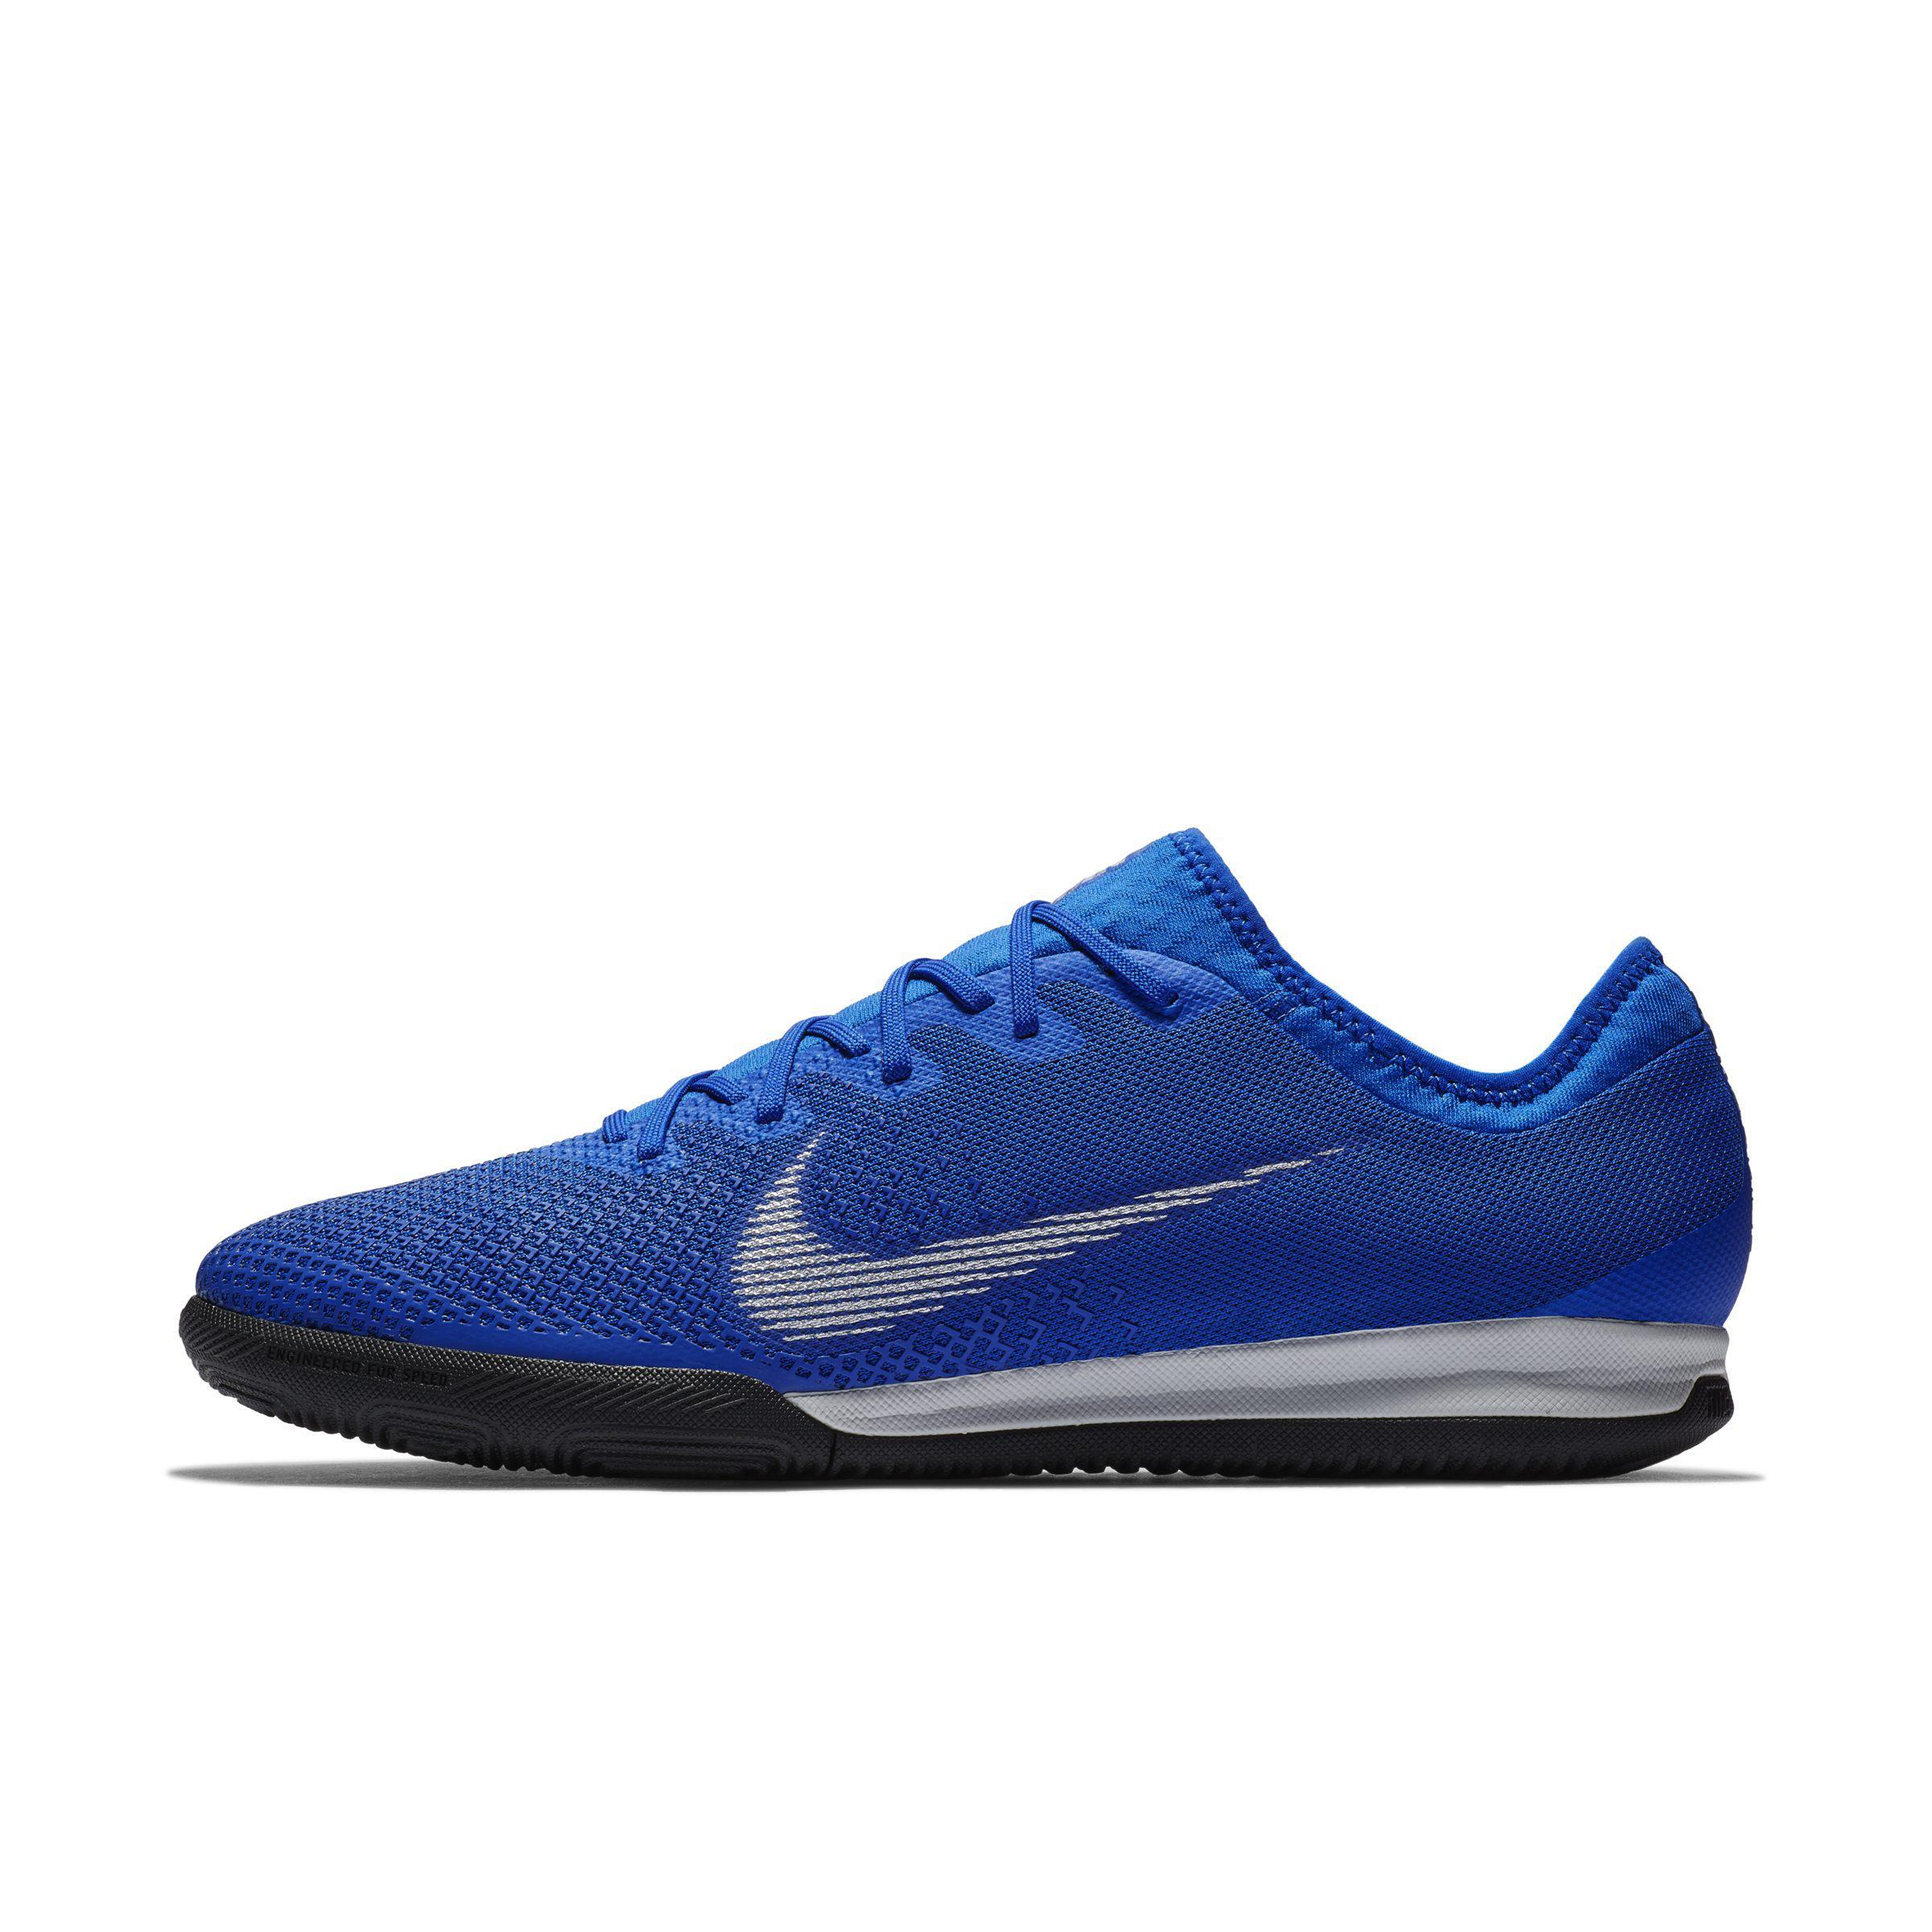 d67b255bbd2e Nike Mercurialx Vapor Xii Pro Indoor court Football Shoe in Blue - Lyst